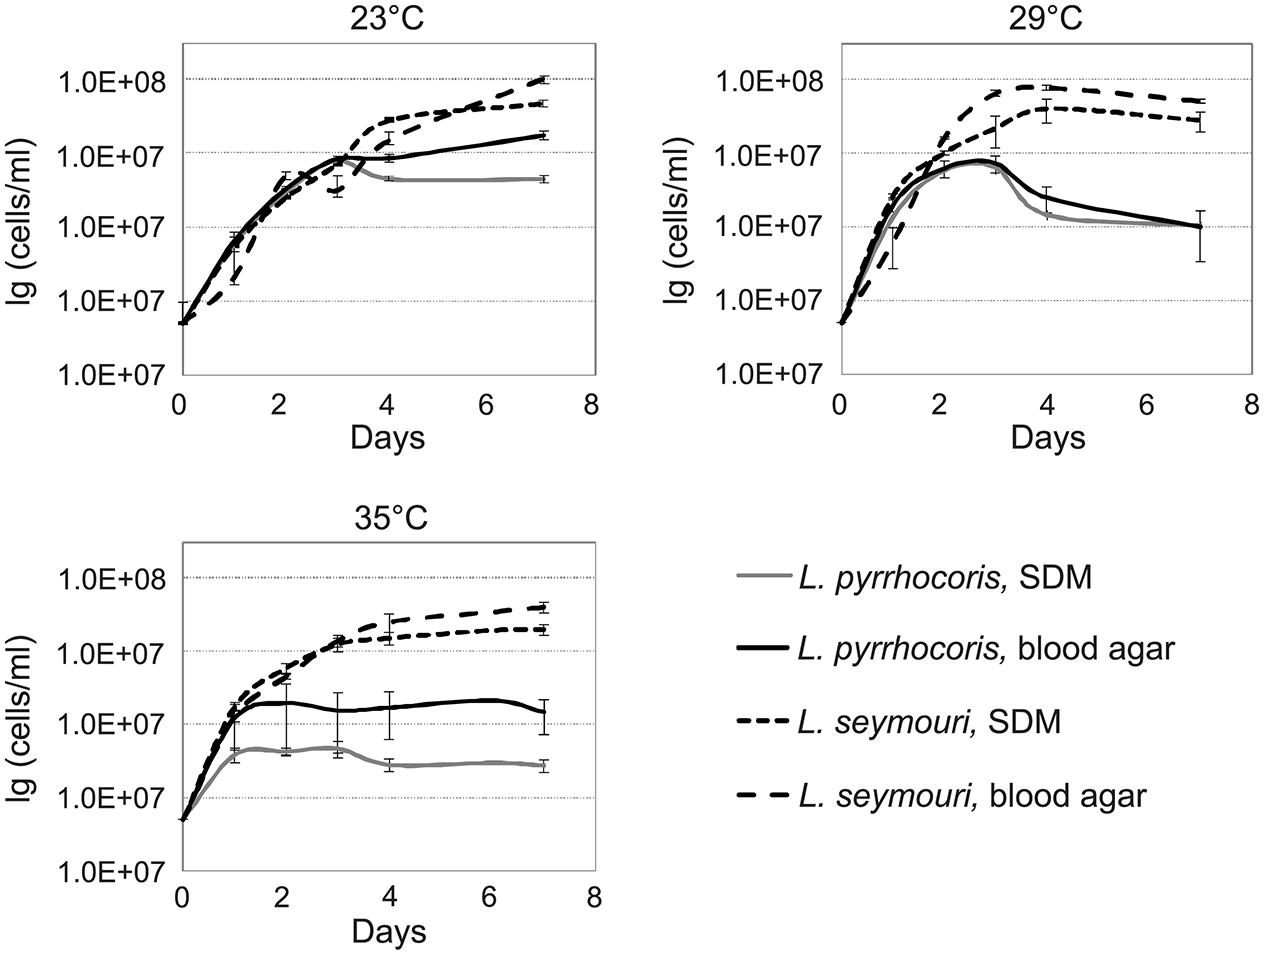 Growth kinetics of <i>Leptomonas pyrrhocoris</i> and <i>L</i>. <i>seymouri</i> at 23°C, 29°C, and 35°C in SDM and blood-agar media.